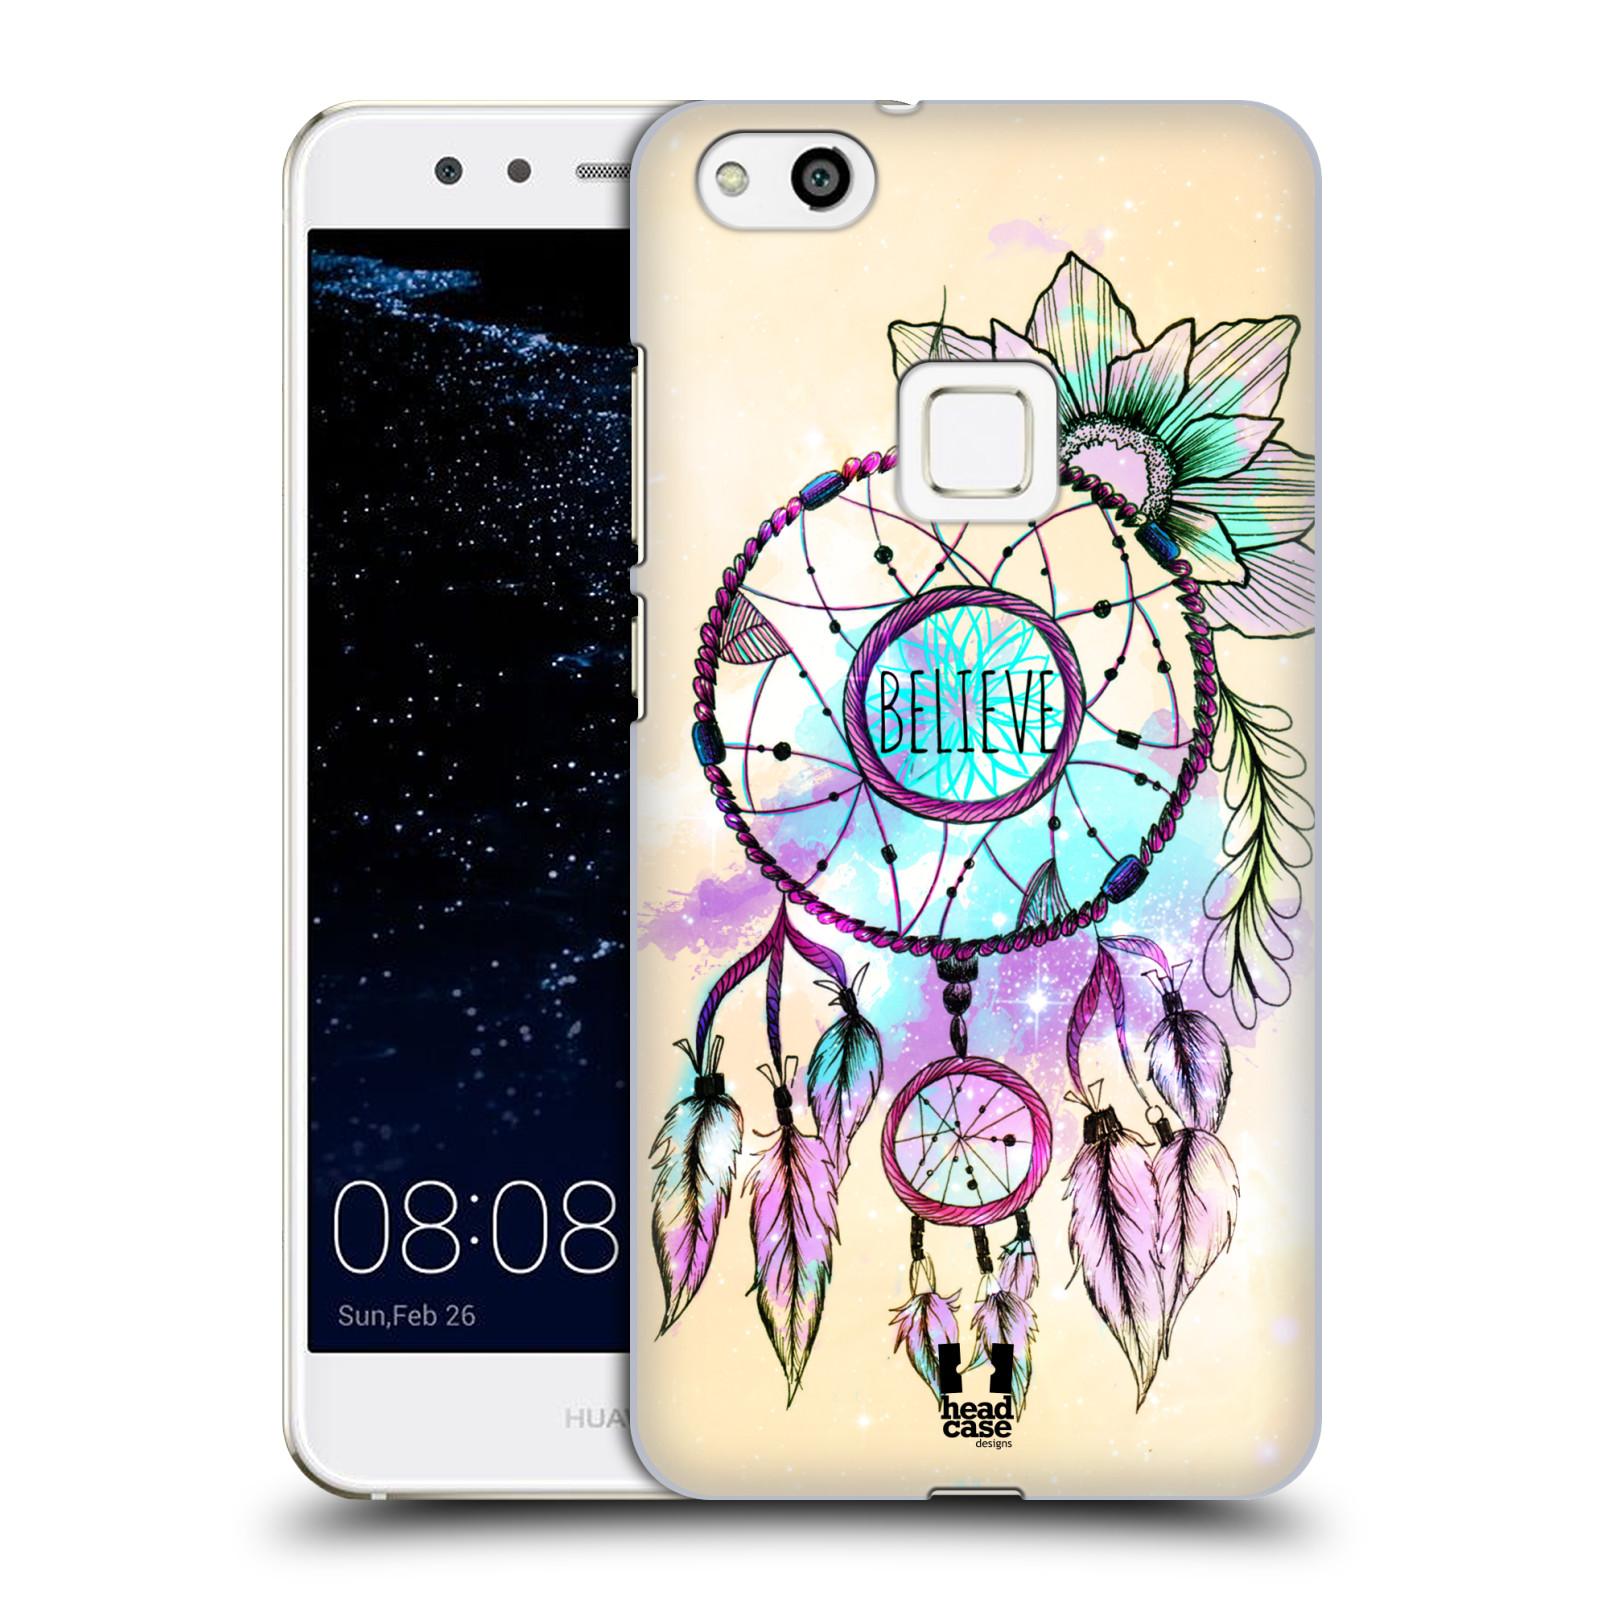 Plastové pouzdro na mobil Huawei P10 Lite Head Case - MIX BELIEVE (Plastový kryt či obal na mobilní telefon Huawei P10 Lite Dual SIM (LX1/LX1A))